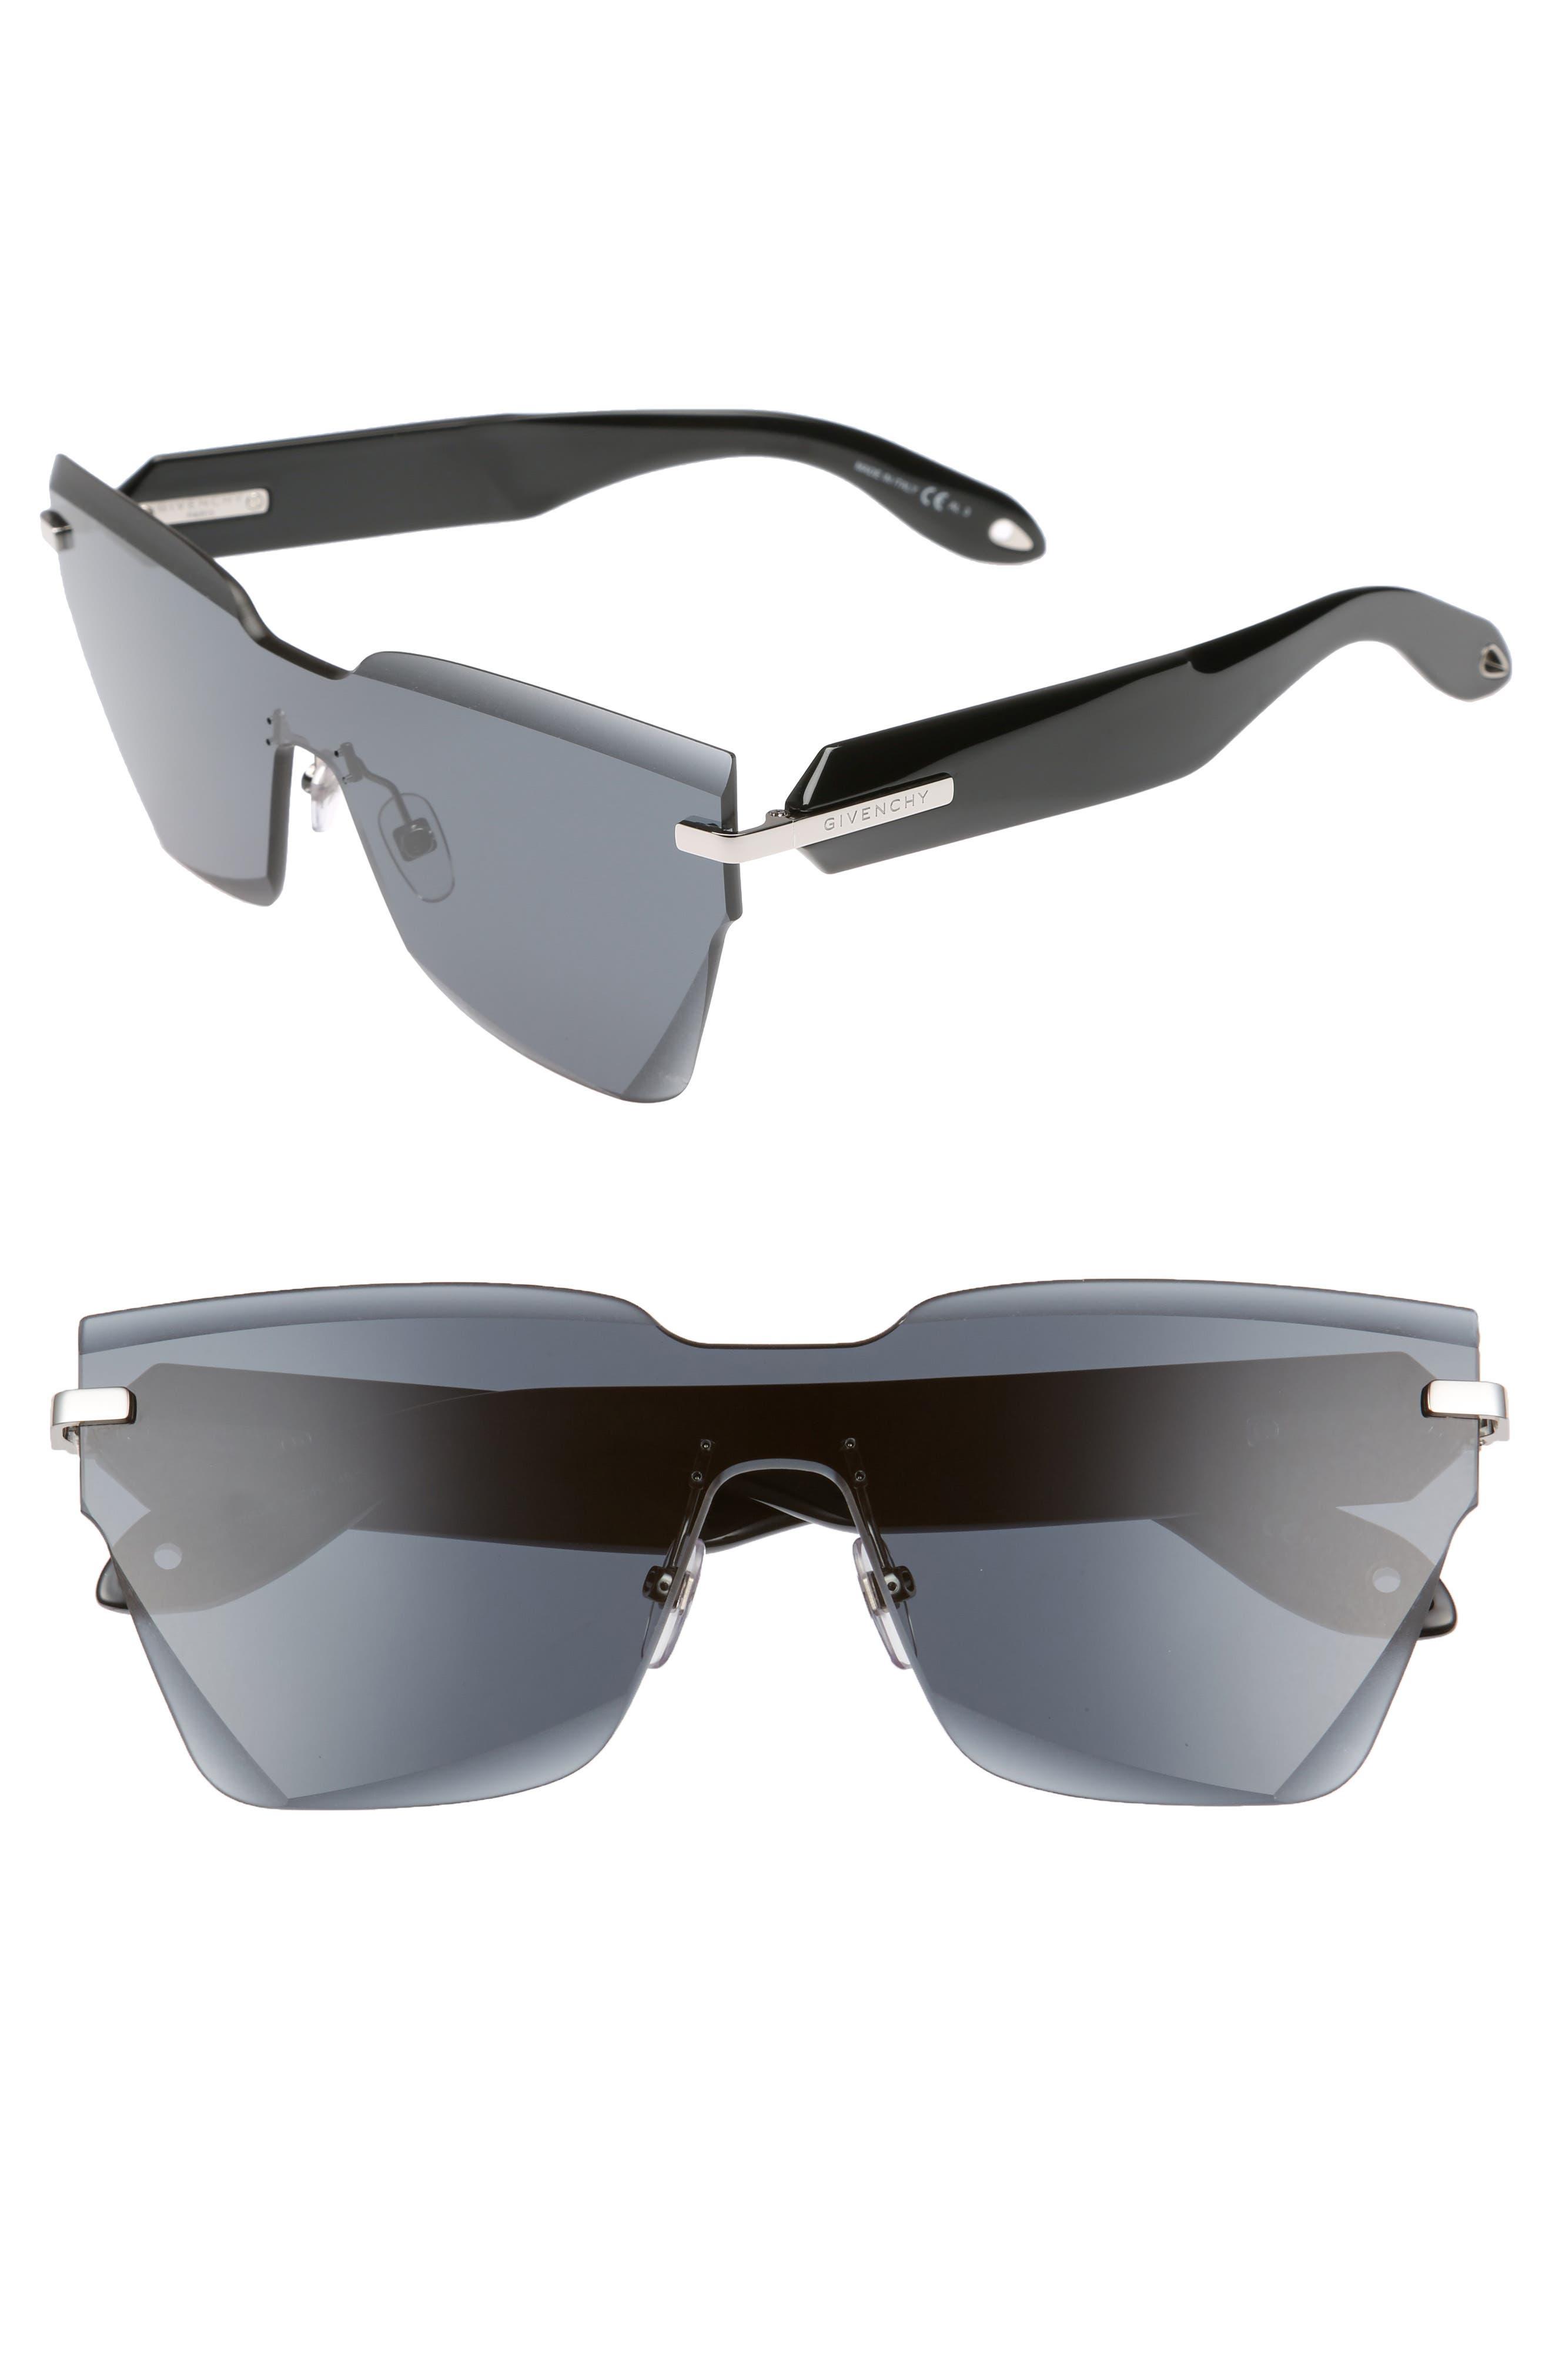 55mm Rimless Shield Sunglasses,                         Main,                         color, Grey Black